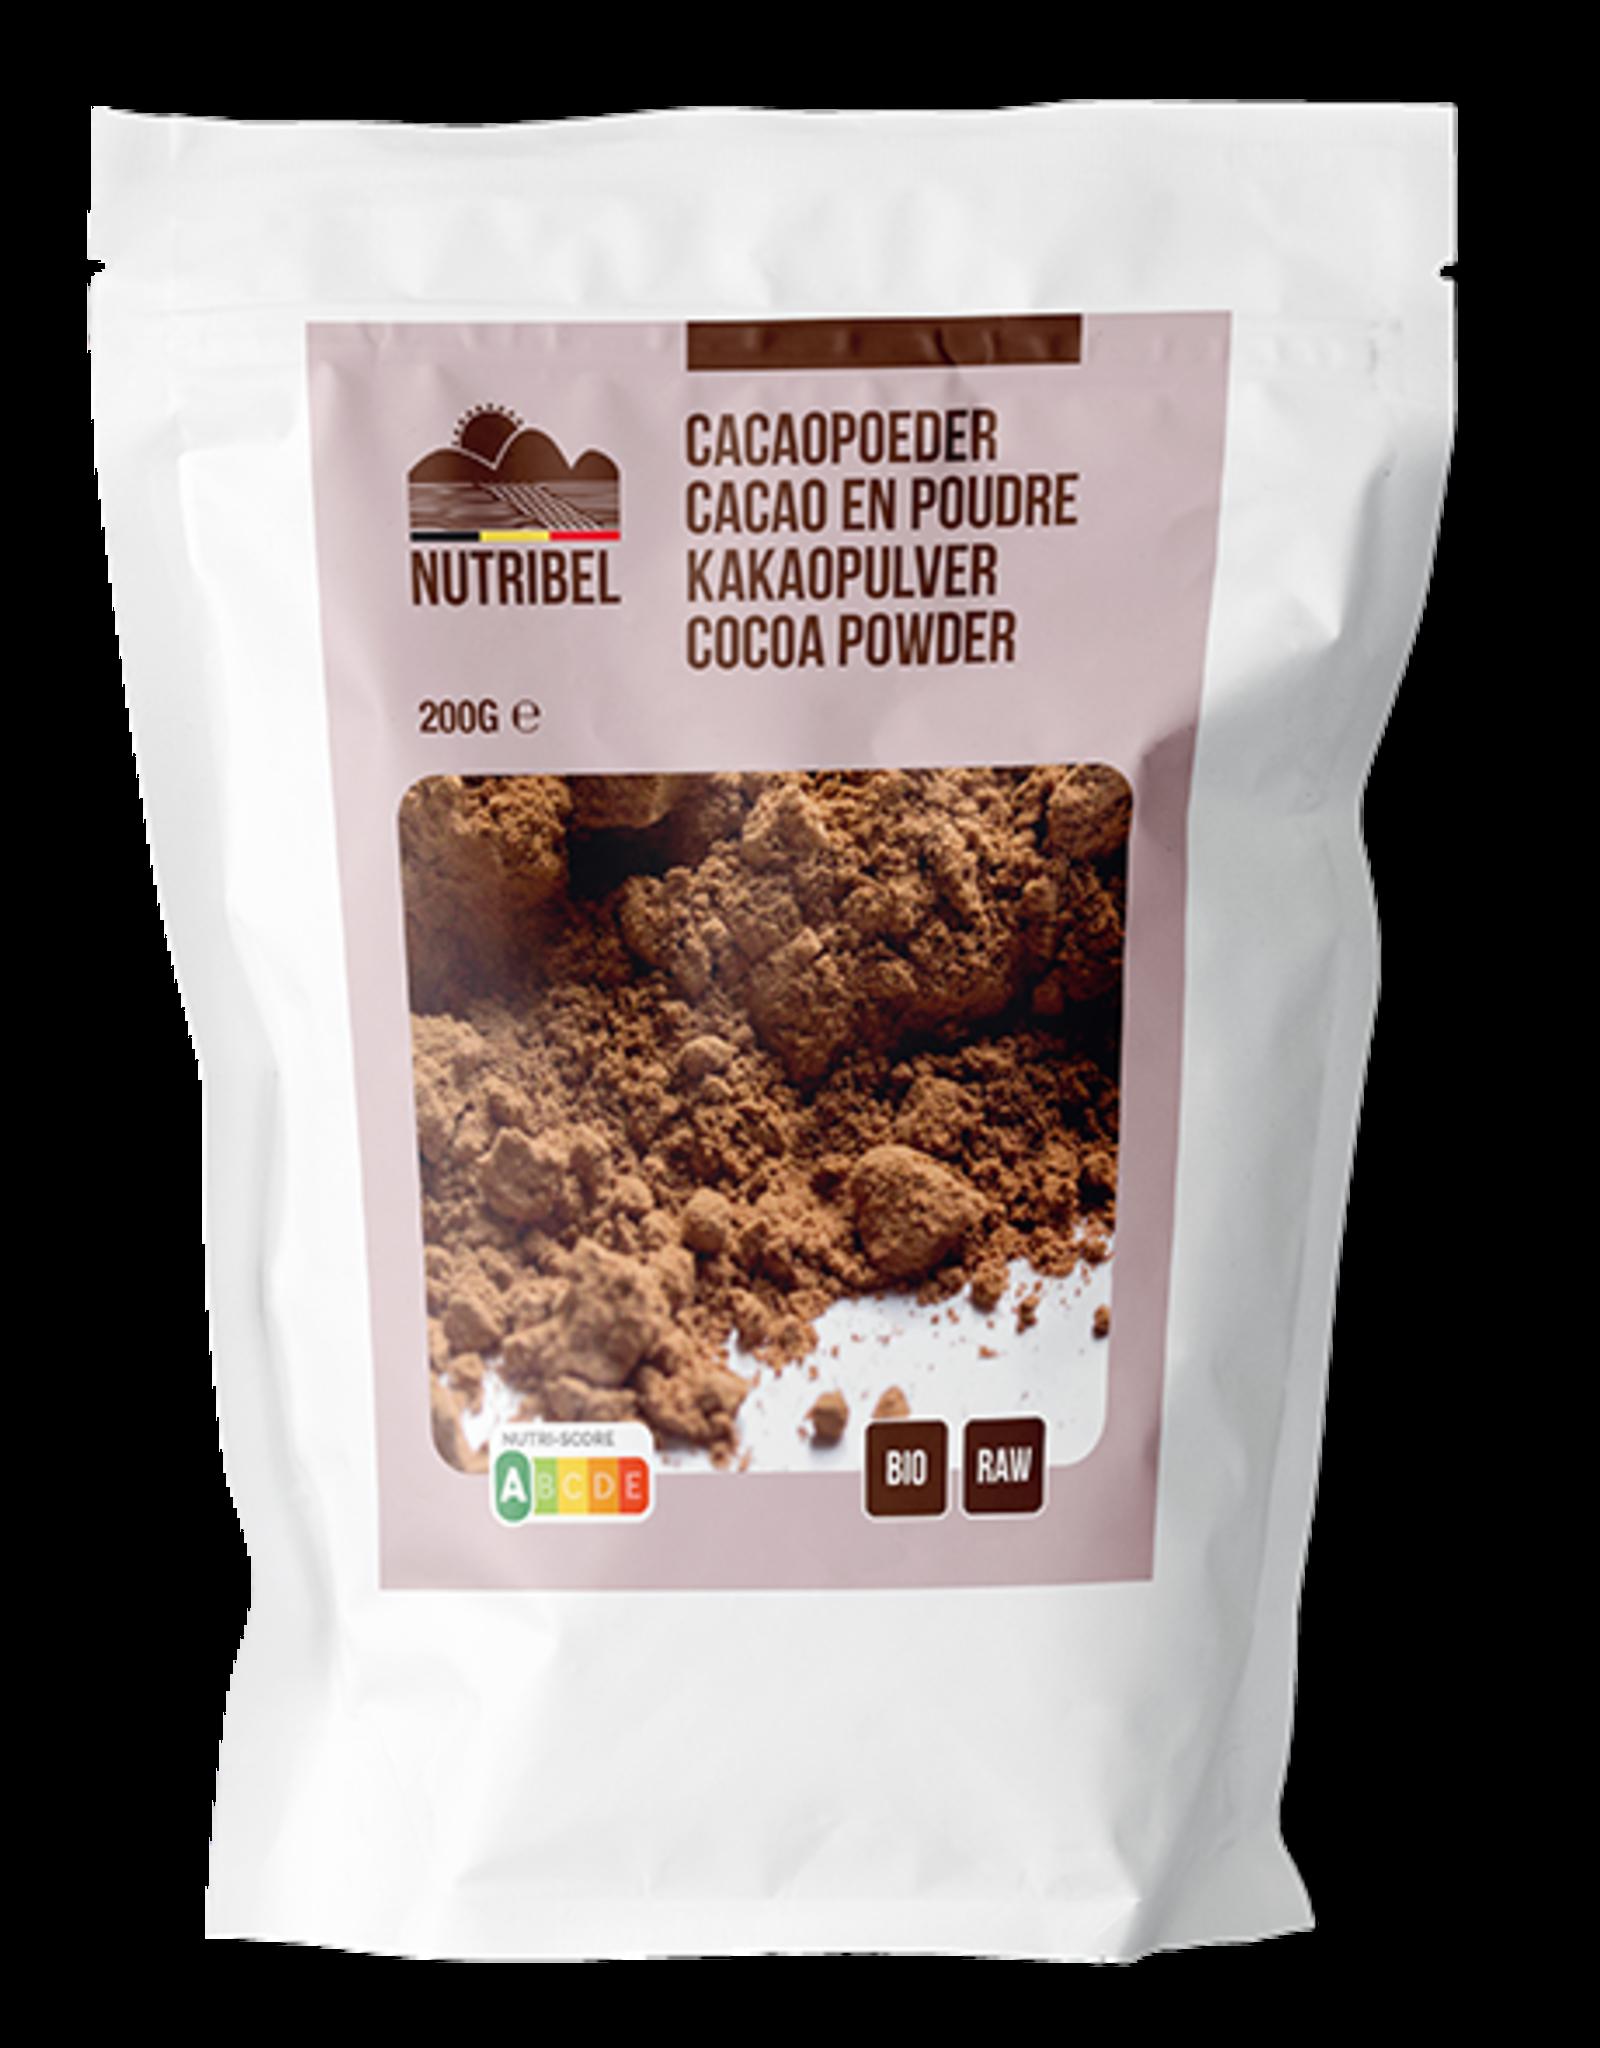 Nutribel Cacao poeder bio & raw 200g